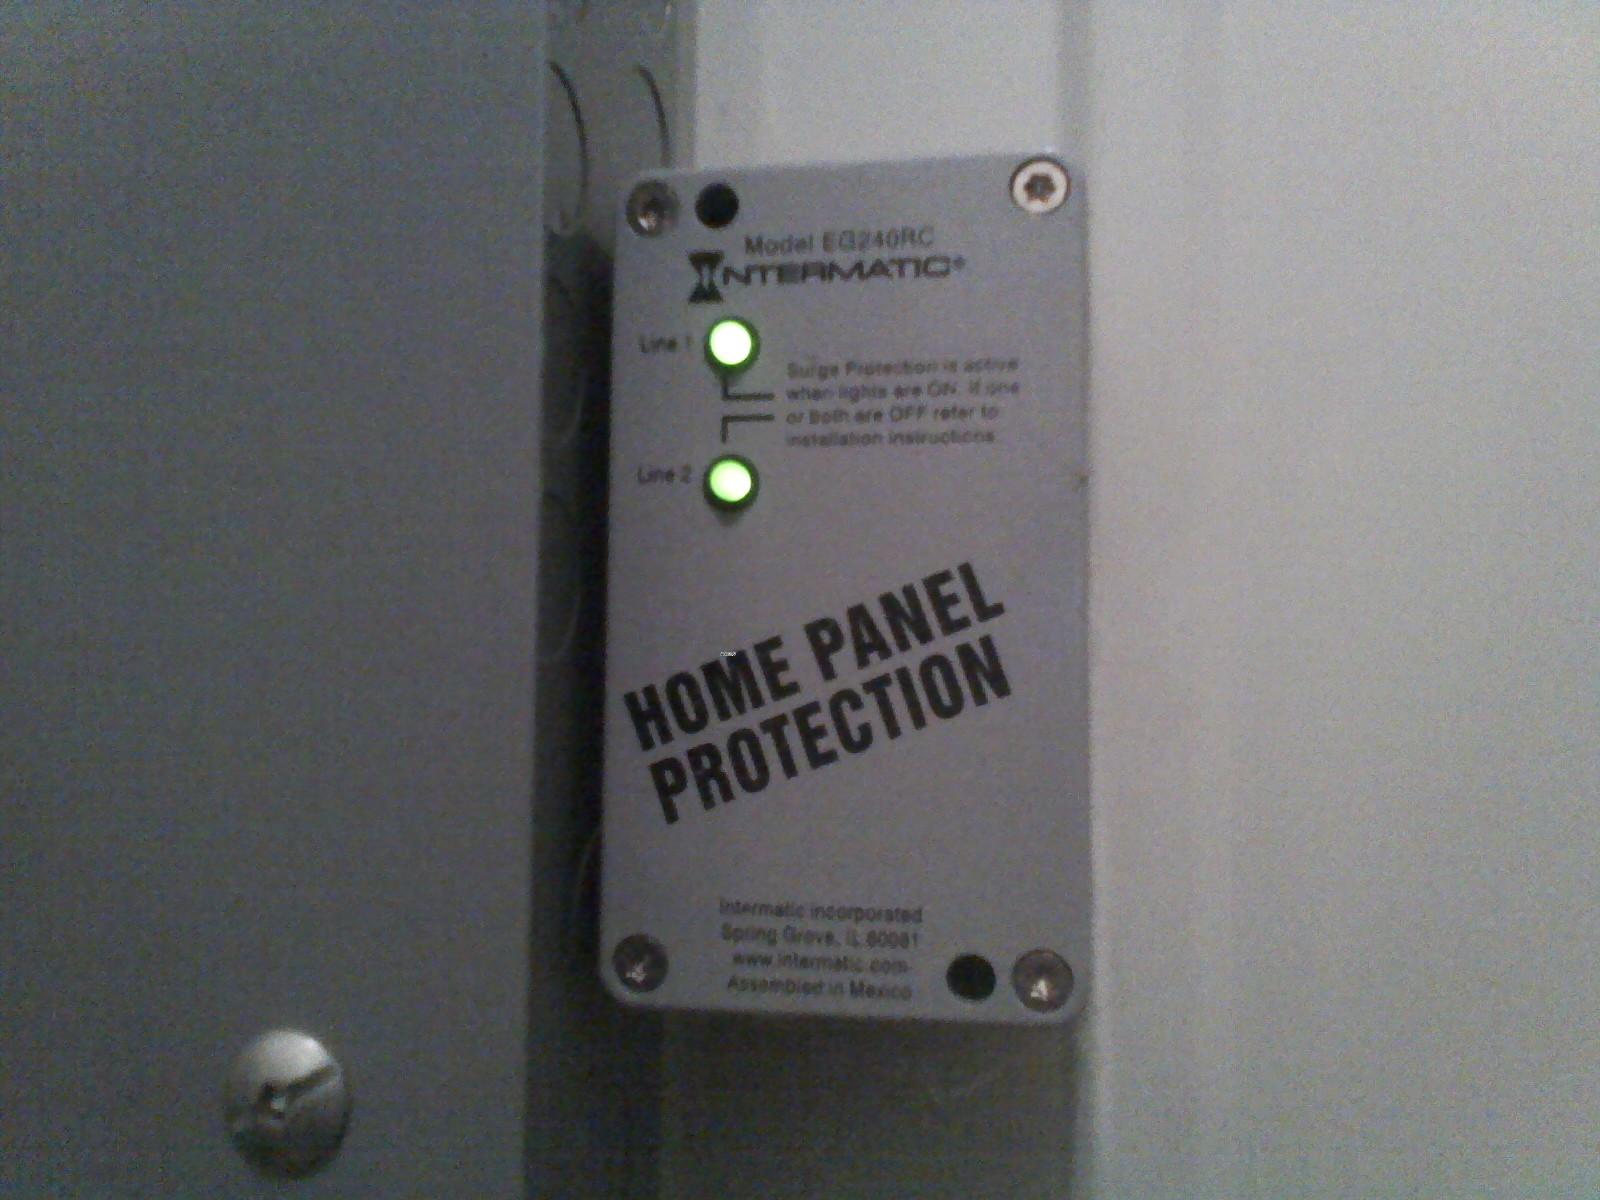 Panel Protector.jpg